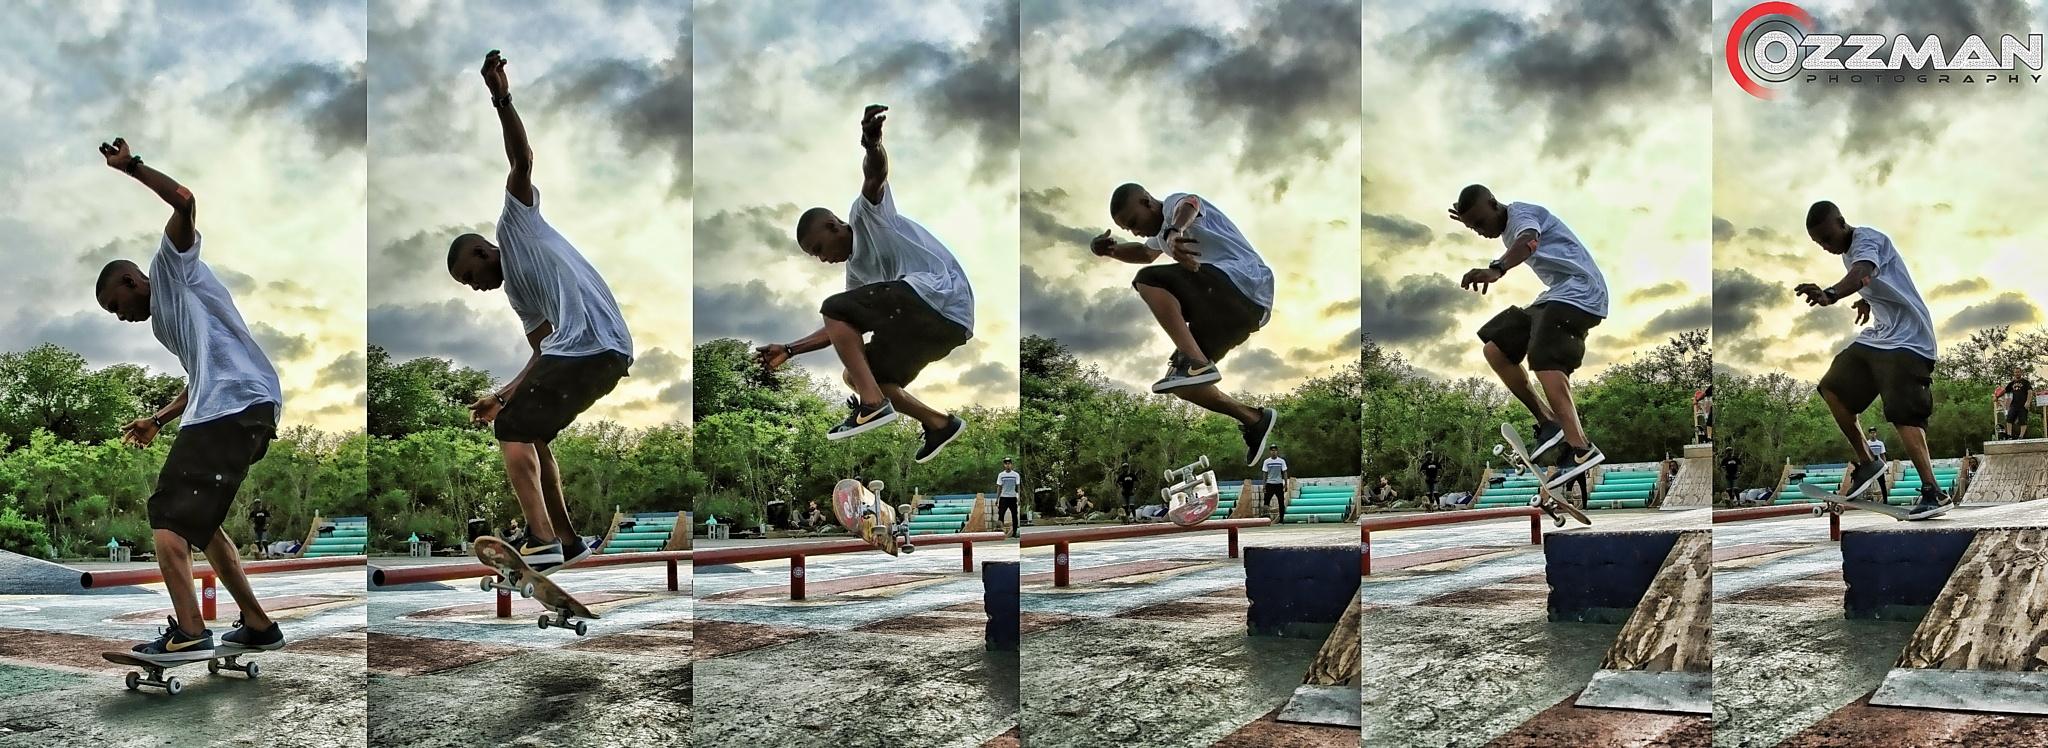 Skill by Ozzy Osborne